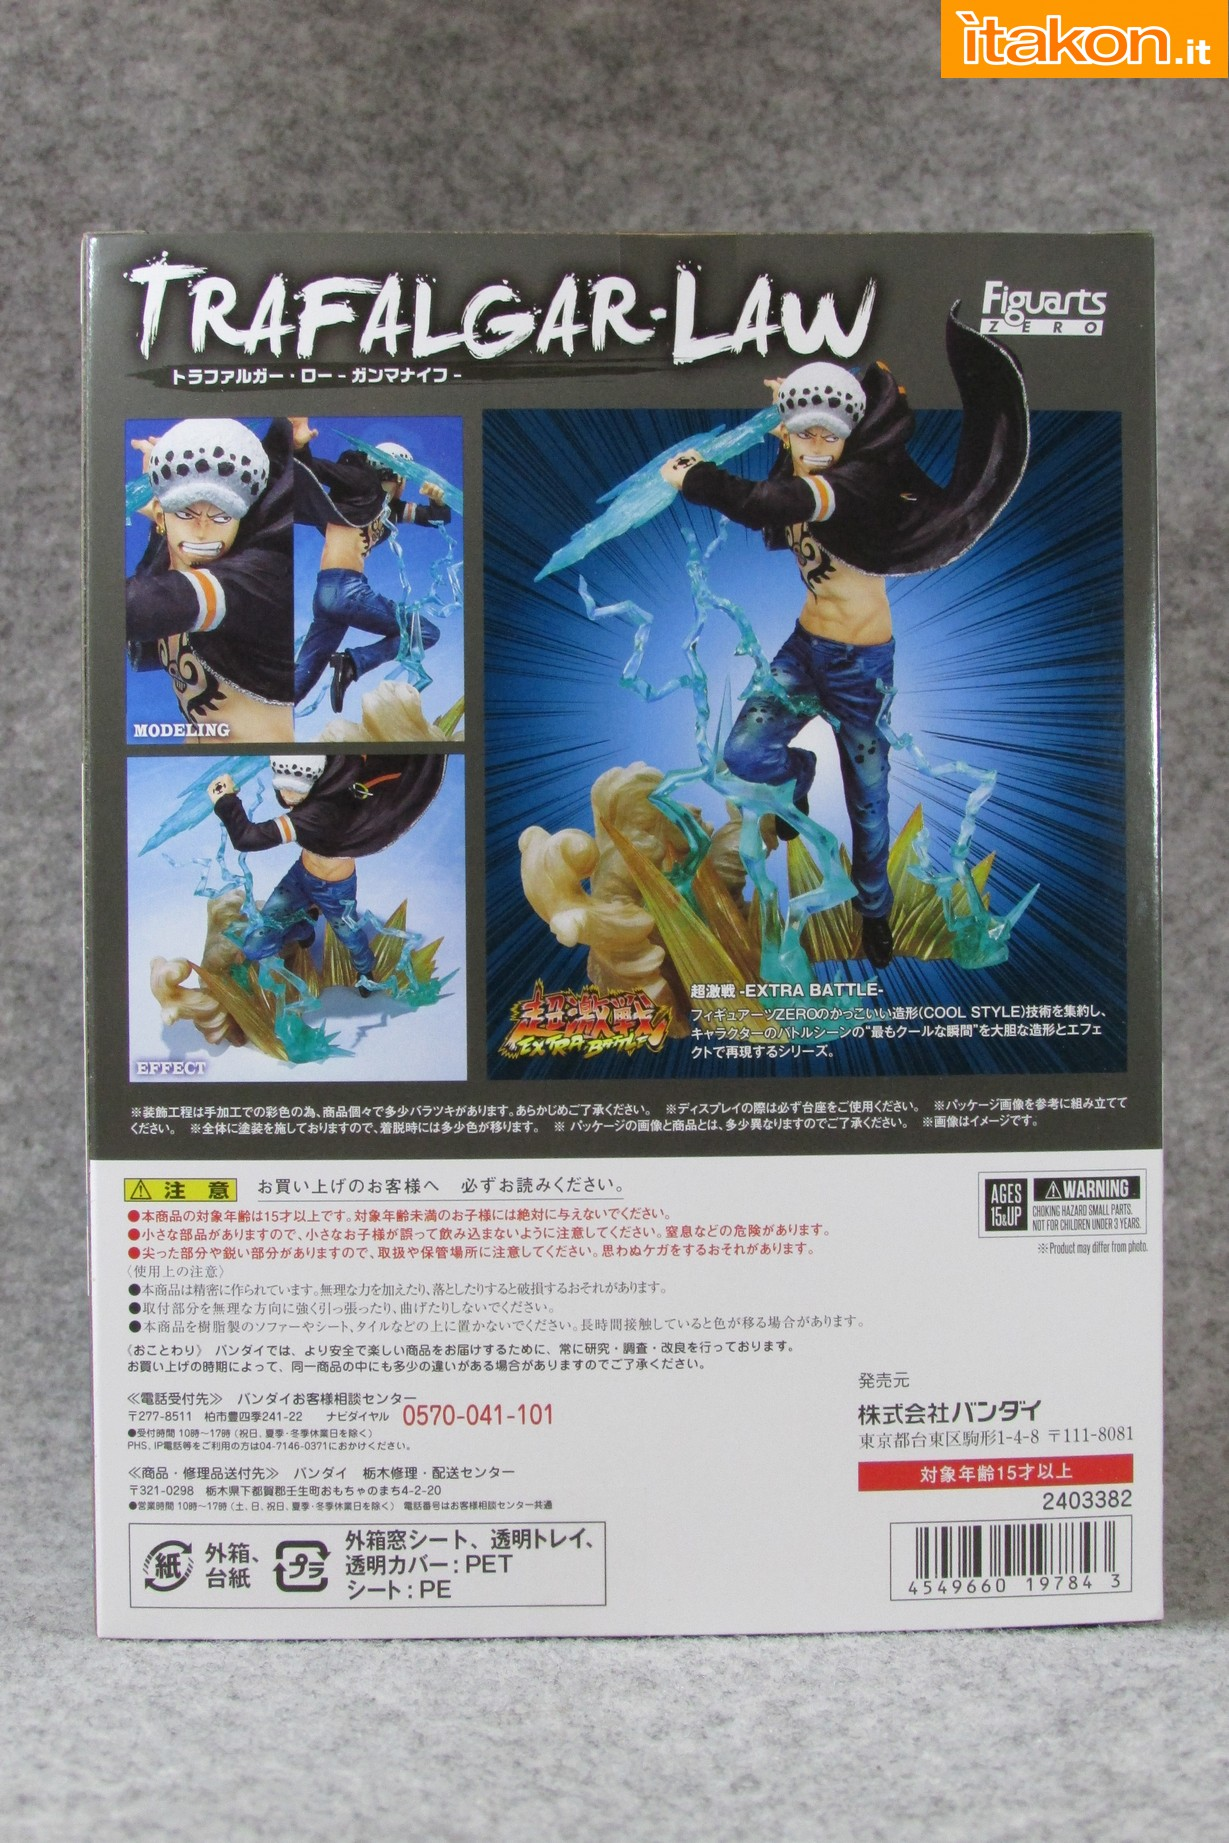 Link a One Piece Trafalgar Law Gamma Knife Figuarts ZERO Chou Gekisen Extra Battle Recensione Review Itakon.it 04